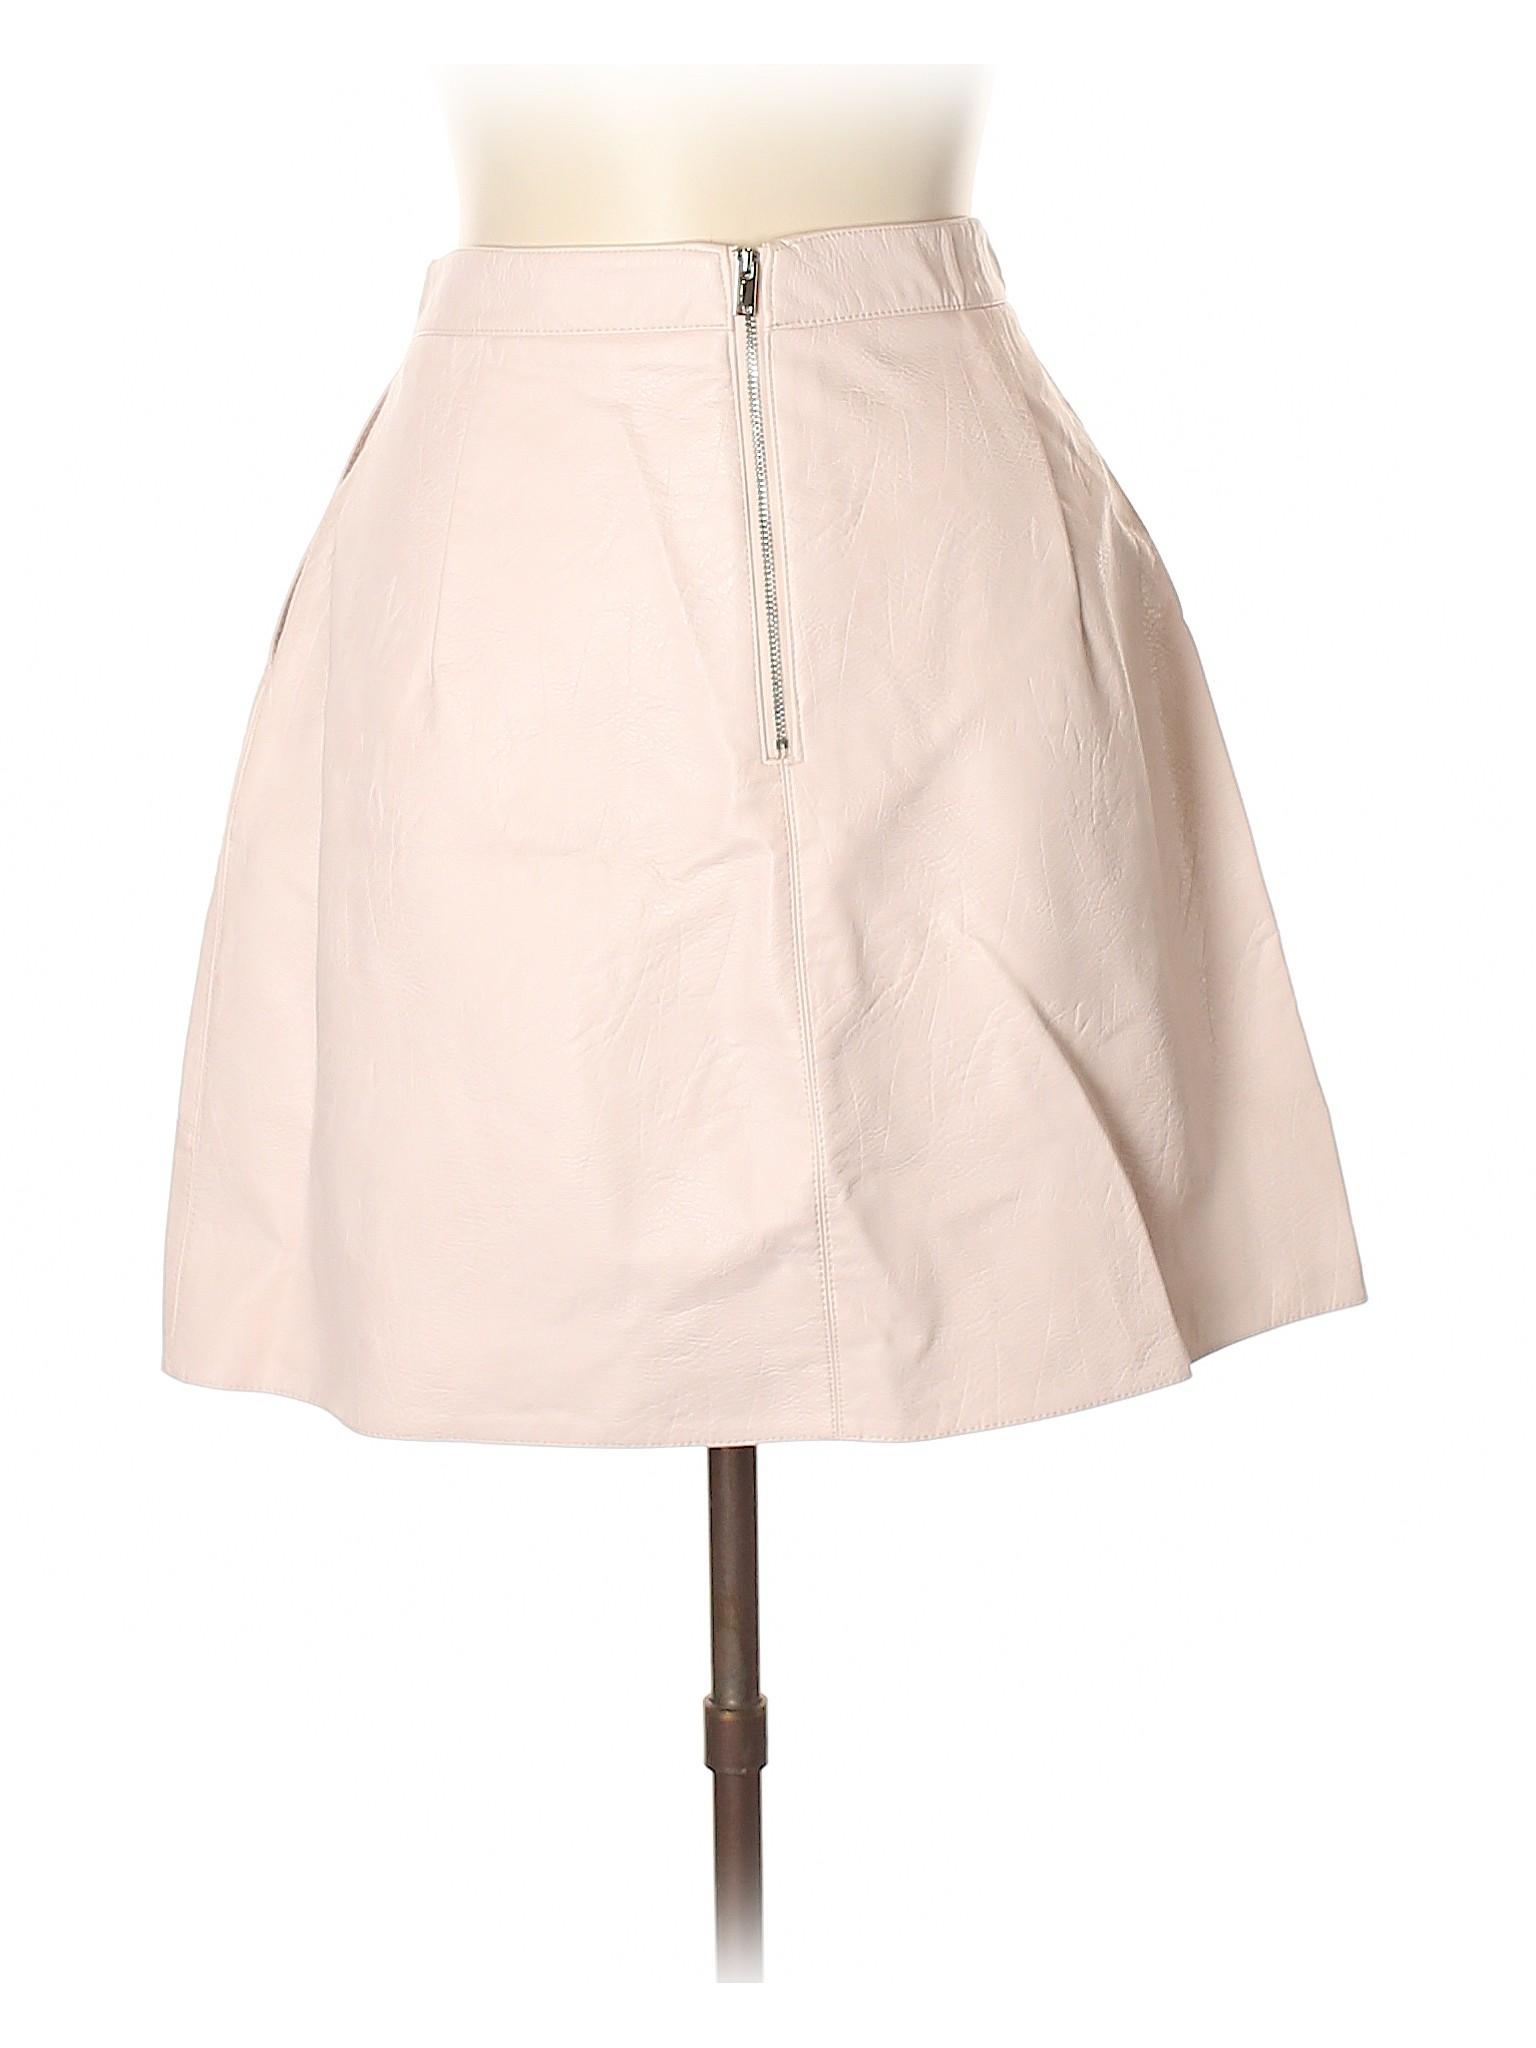 Faux Boutique Skirt Leather Leather Leather Skirt Boutique Boutique Leather Faux Skirt Skirt Faux Boutique Faux Fwq6XSYgp